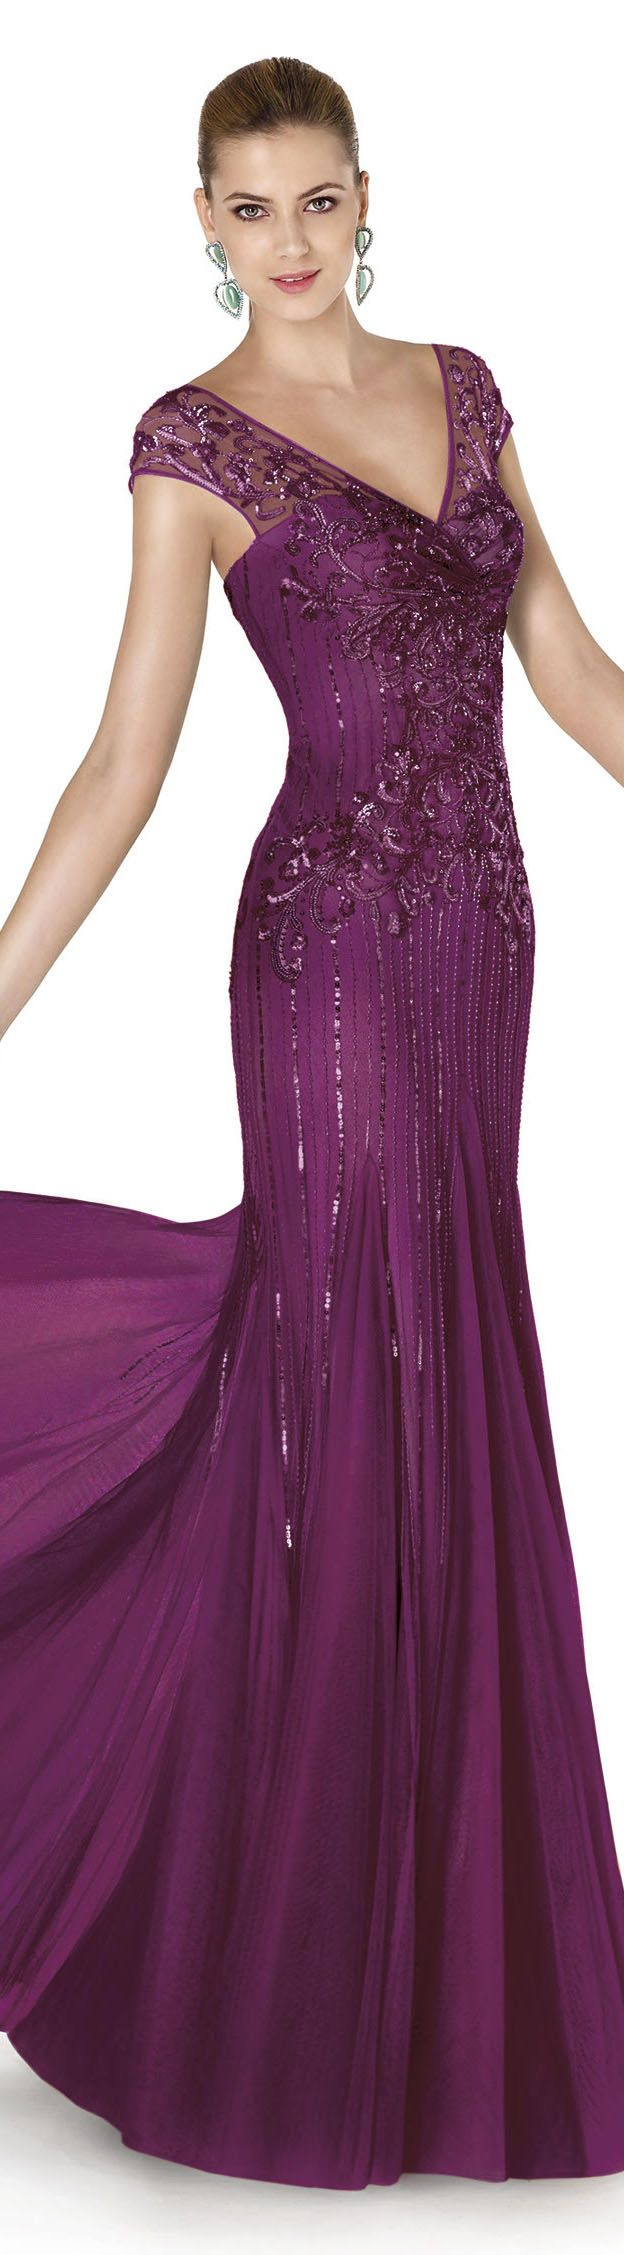 Pronovias 2015 Cocktail Dress Collection (ABADESA) | Lindos Vestidos ...